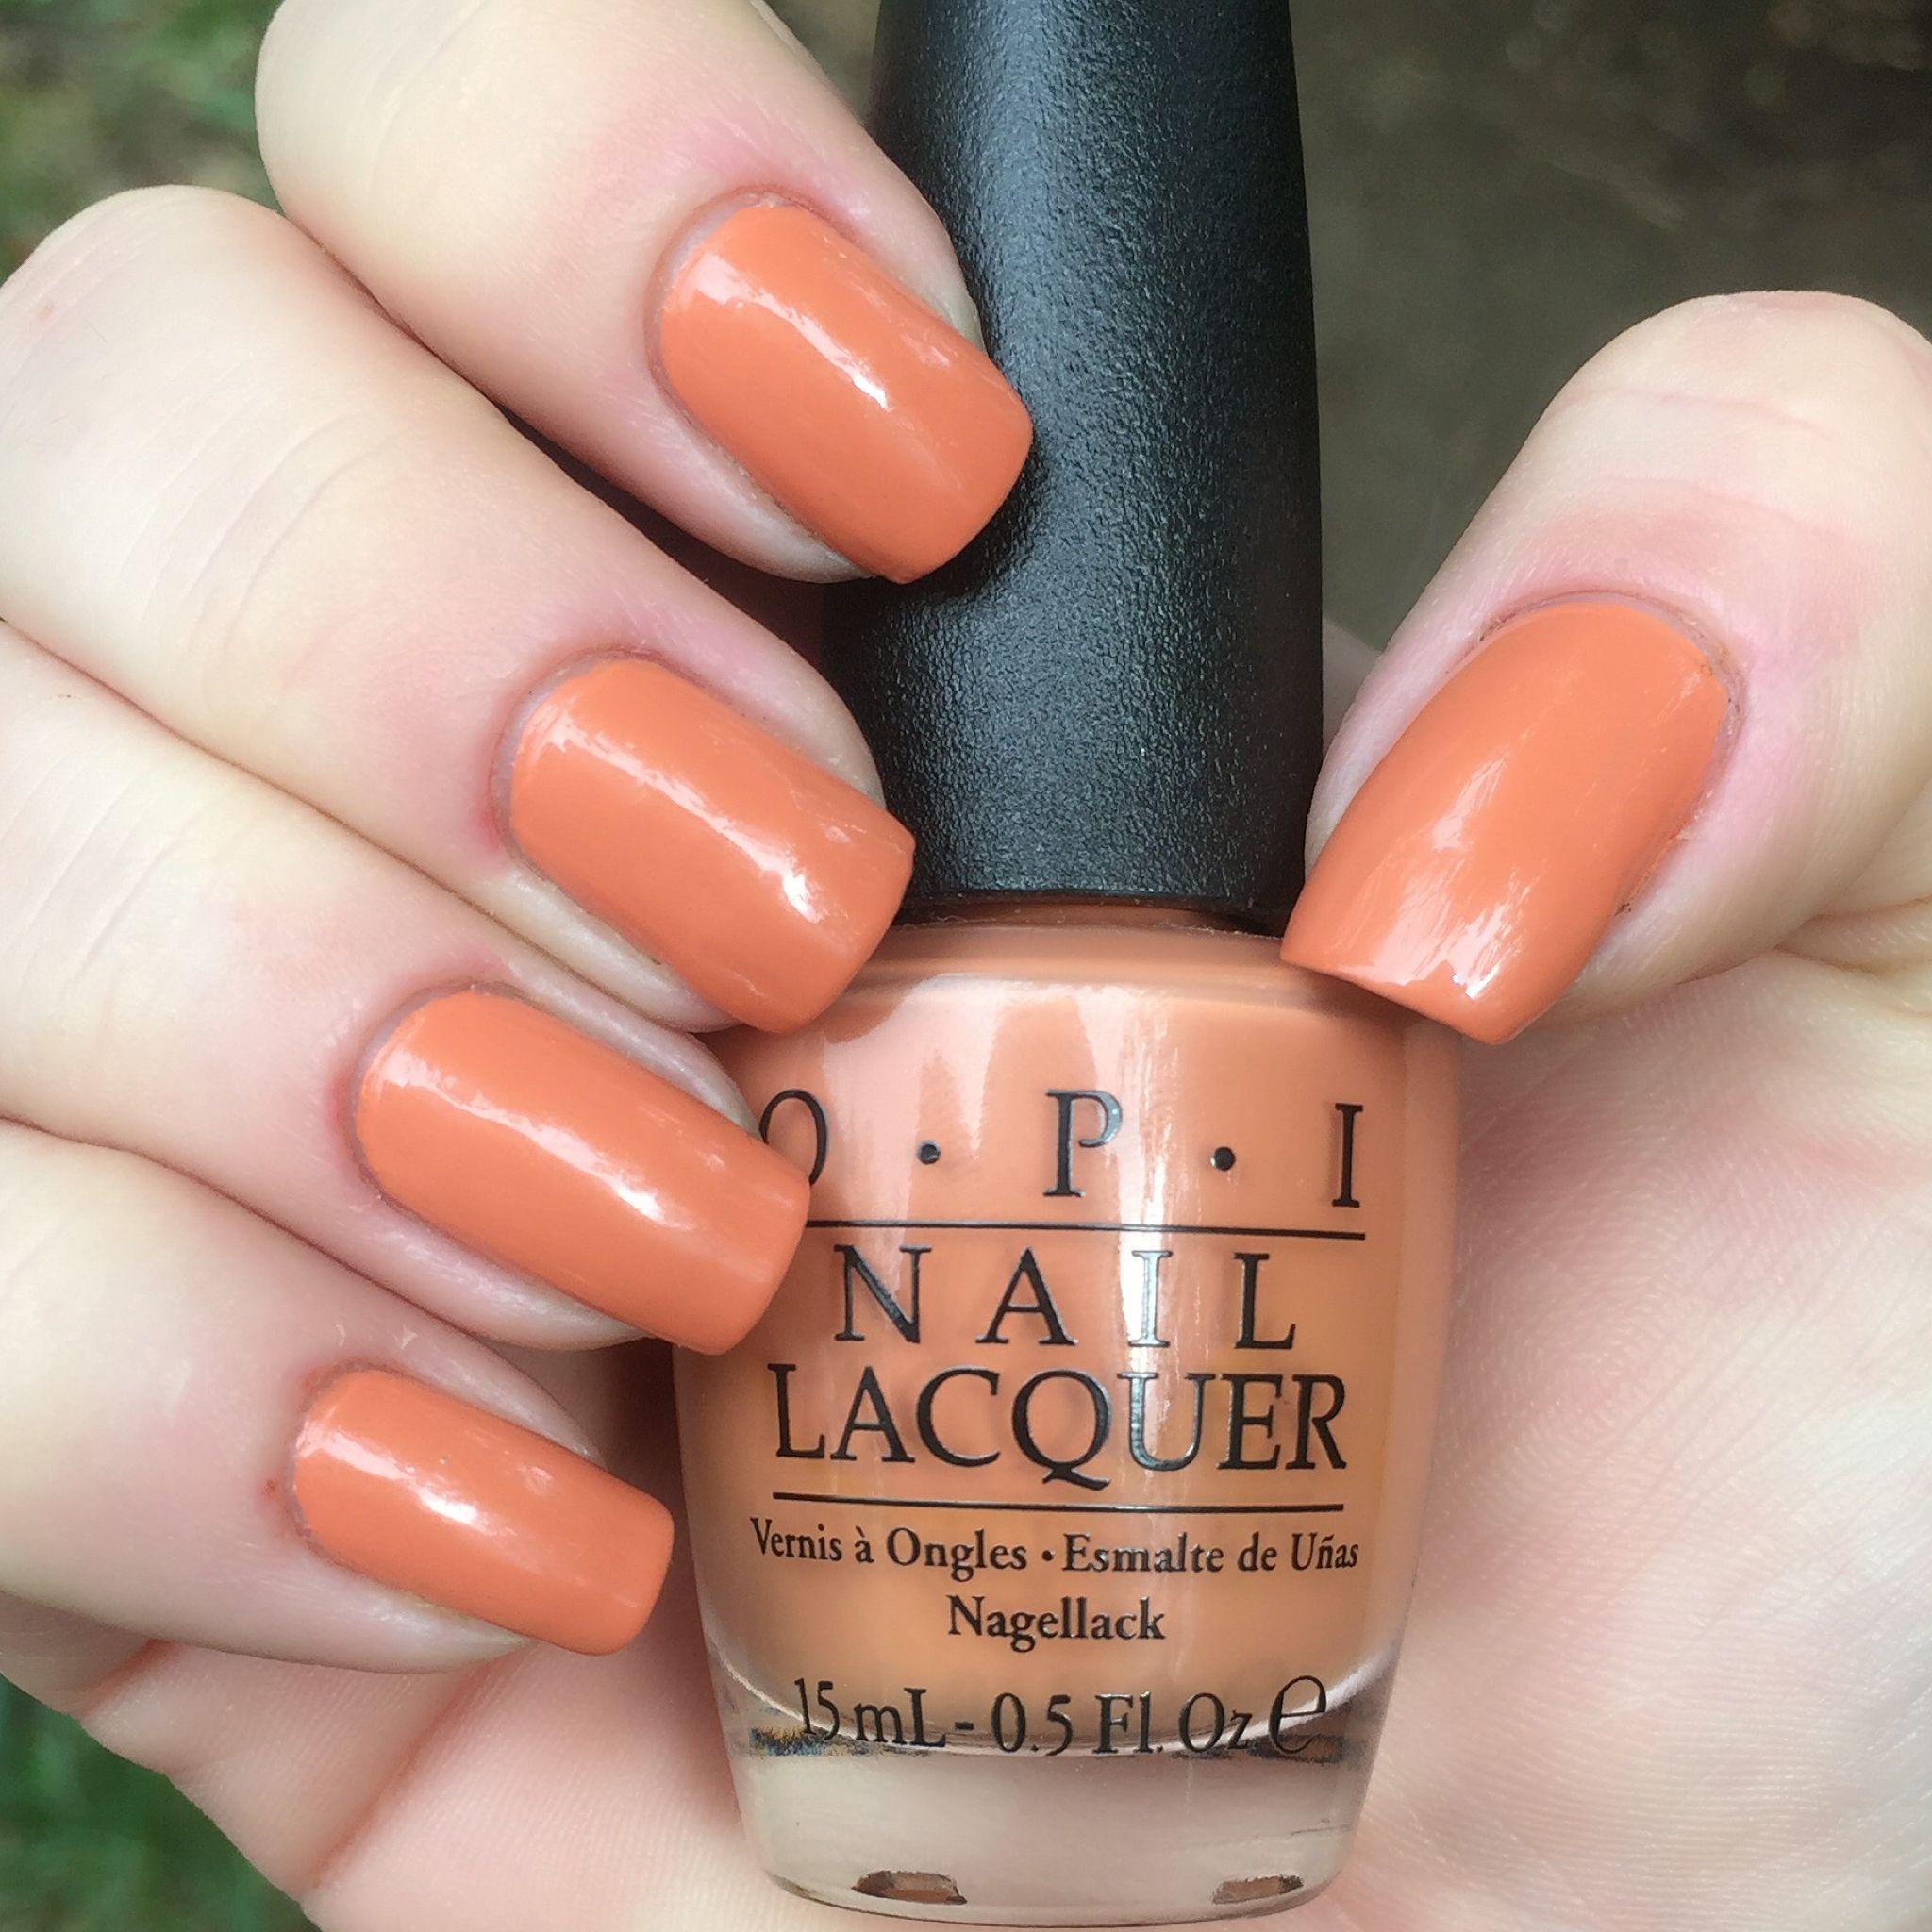 Opi Freedom Of Peach Nails Nailswatch Nailpolishaddict Nailpolishcollection Opi Opifreedomofpeach Opi Gel Opi Gelcolor Gel Color